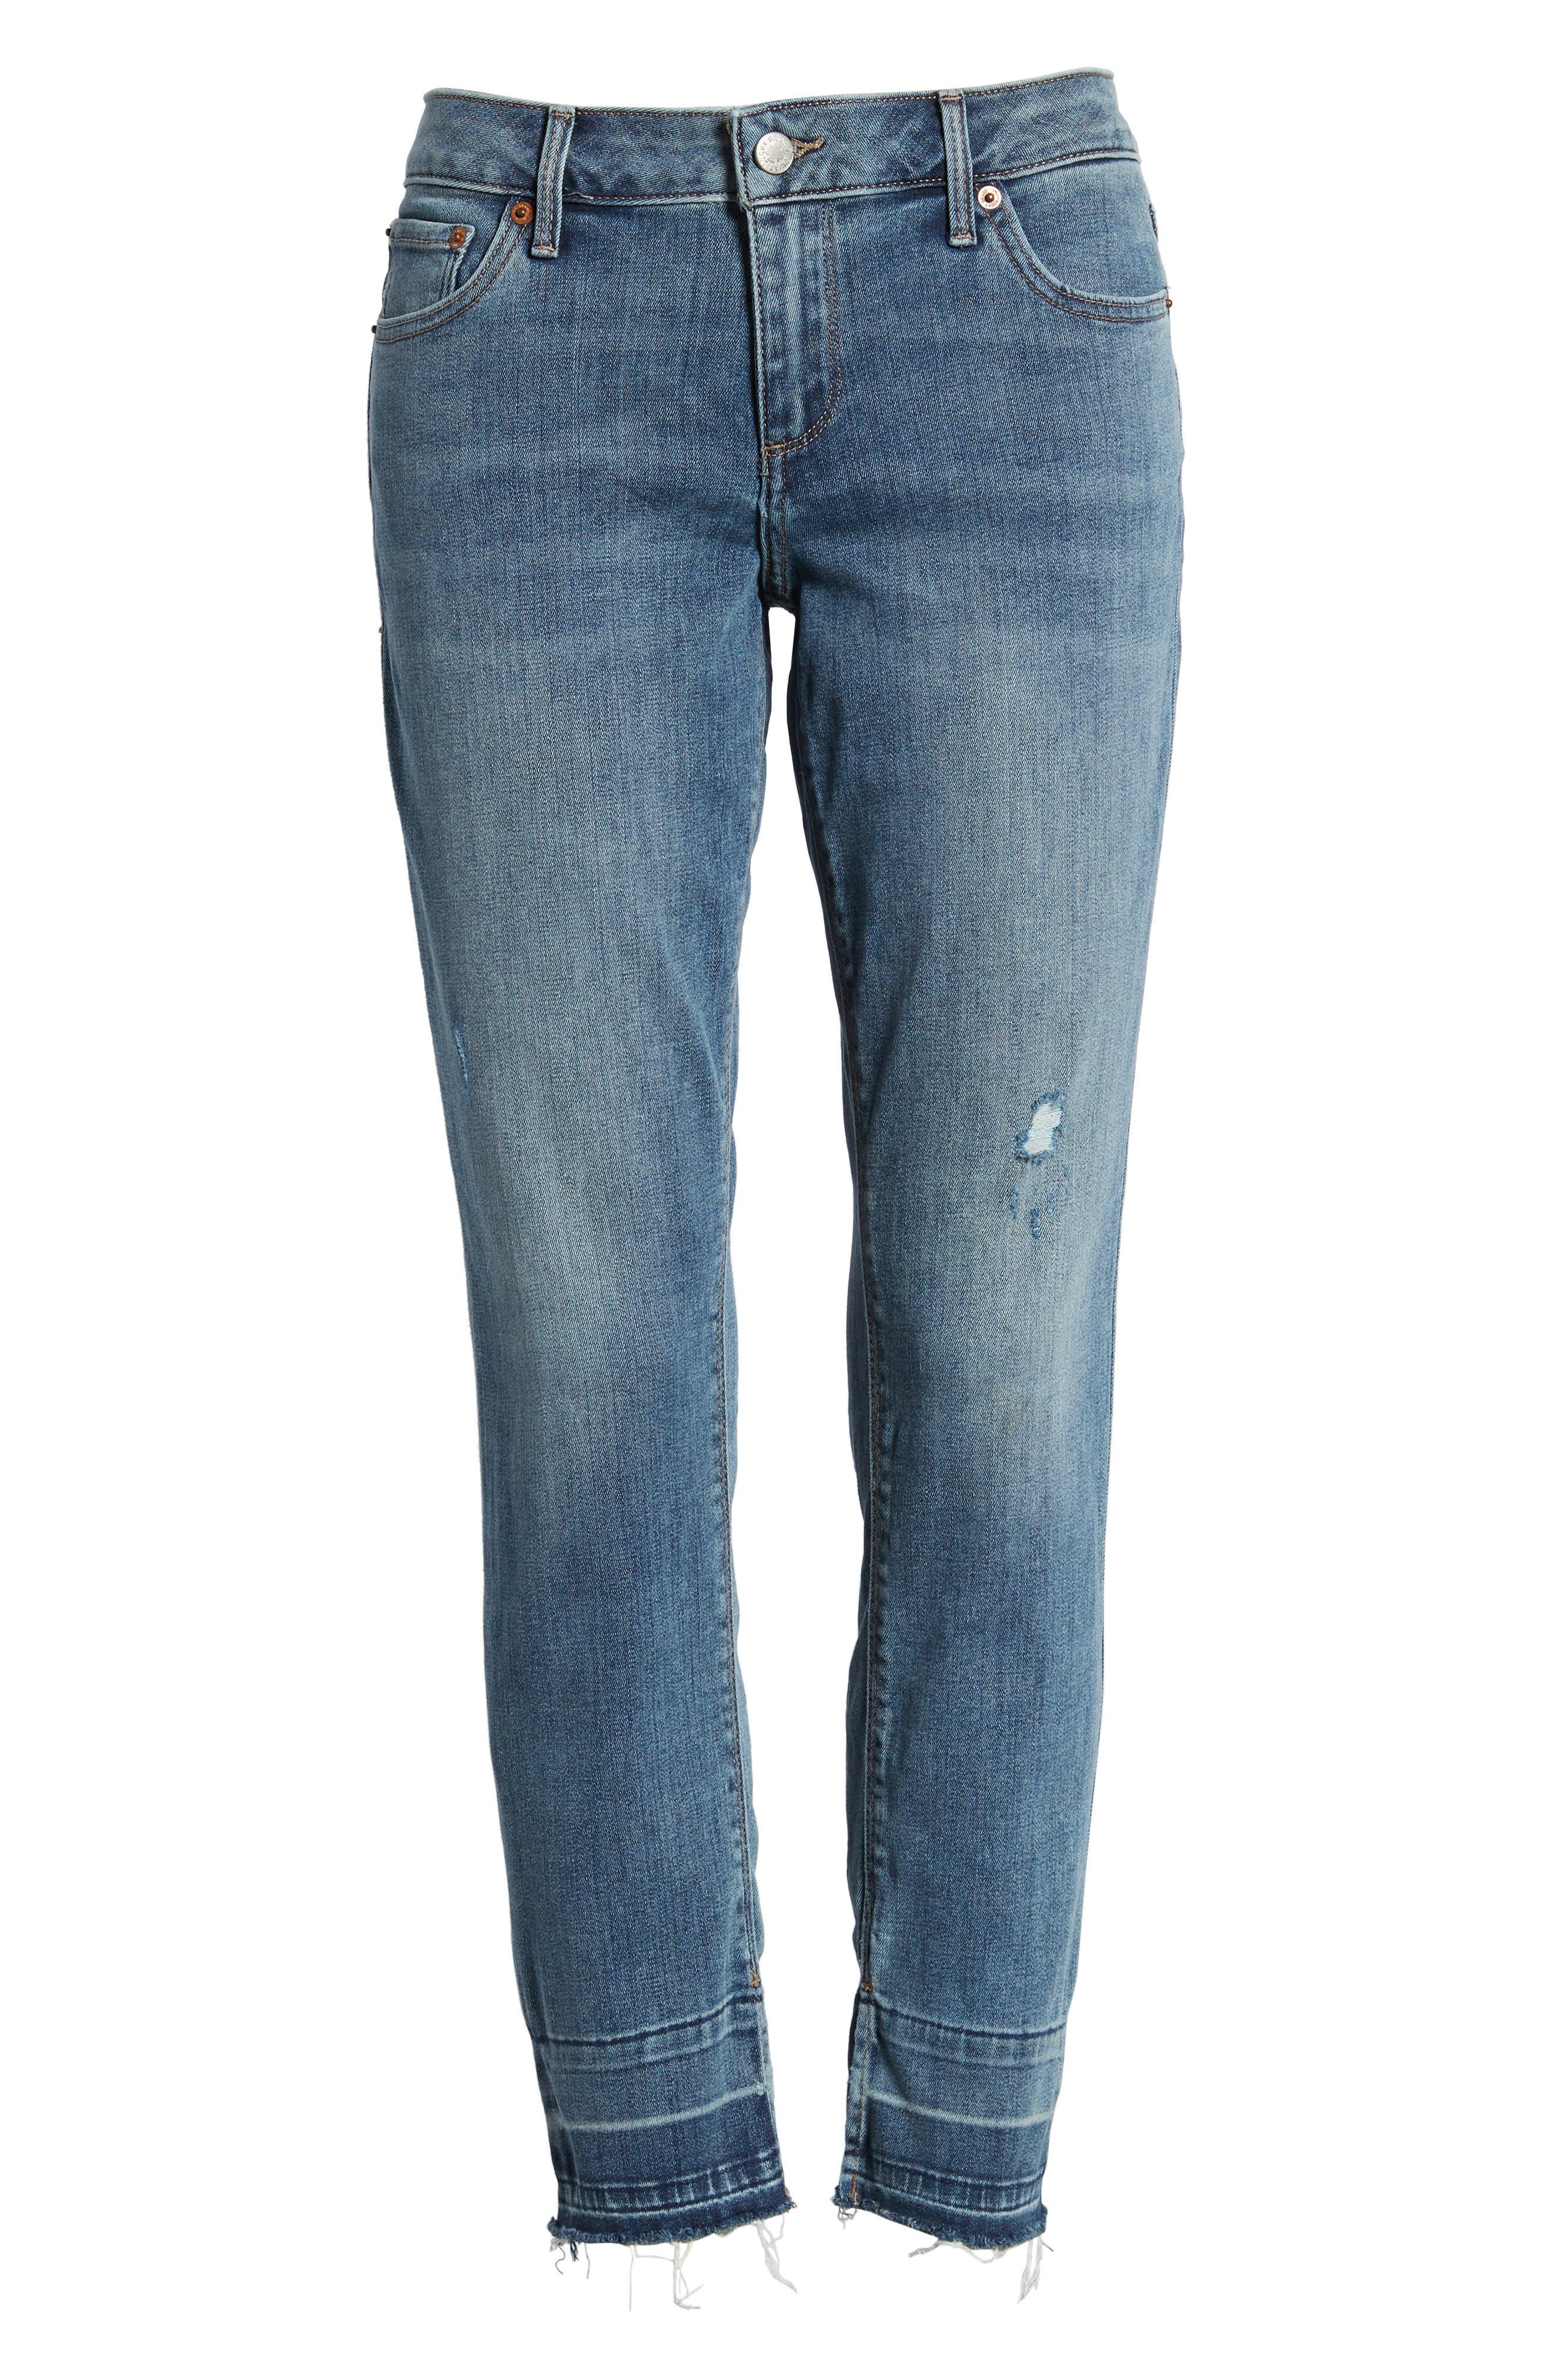 Lolita Skinny Cropped Denim Jeans,                             Alternate thumbnail 7, color,                             420